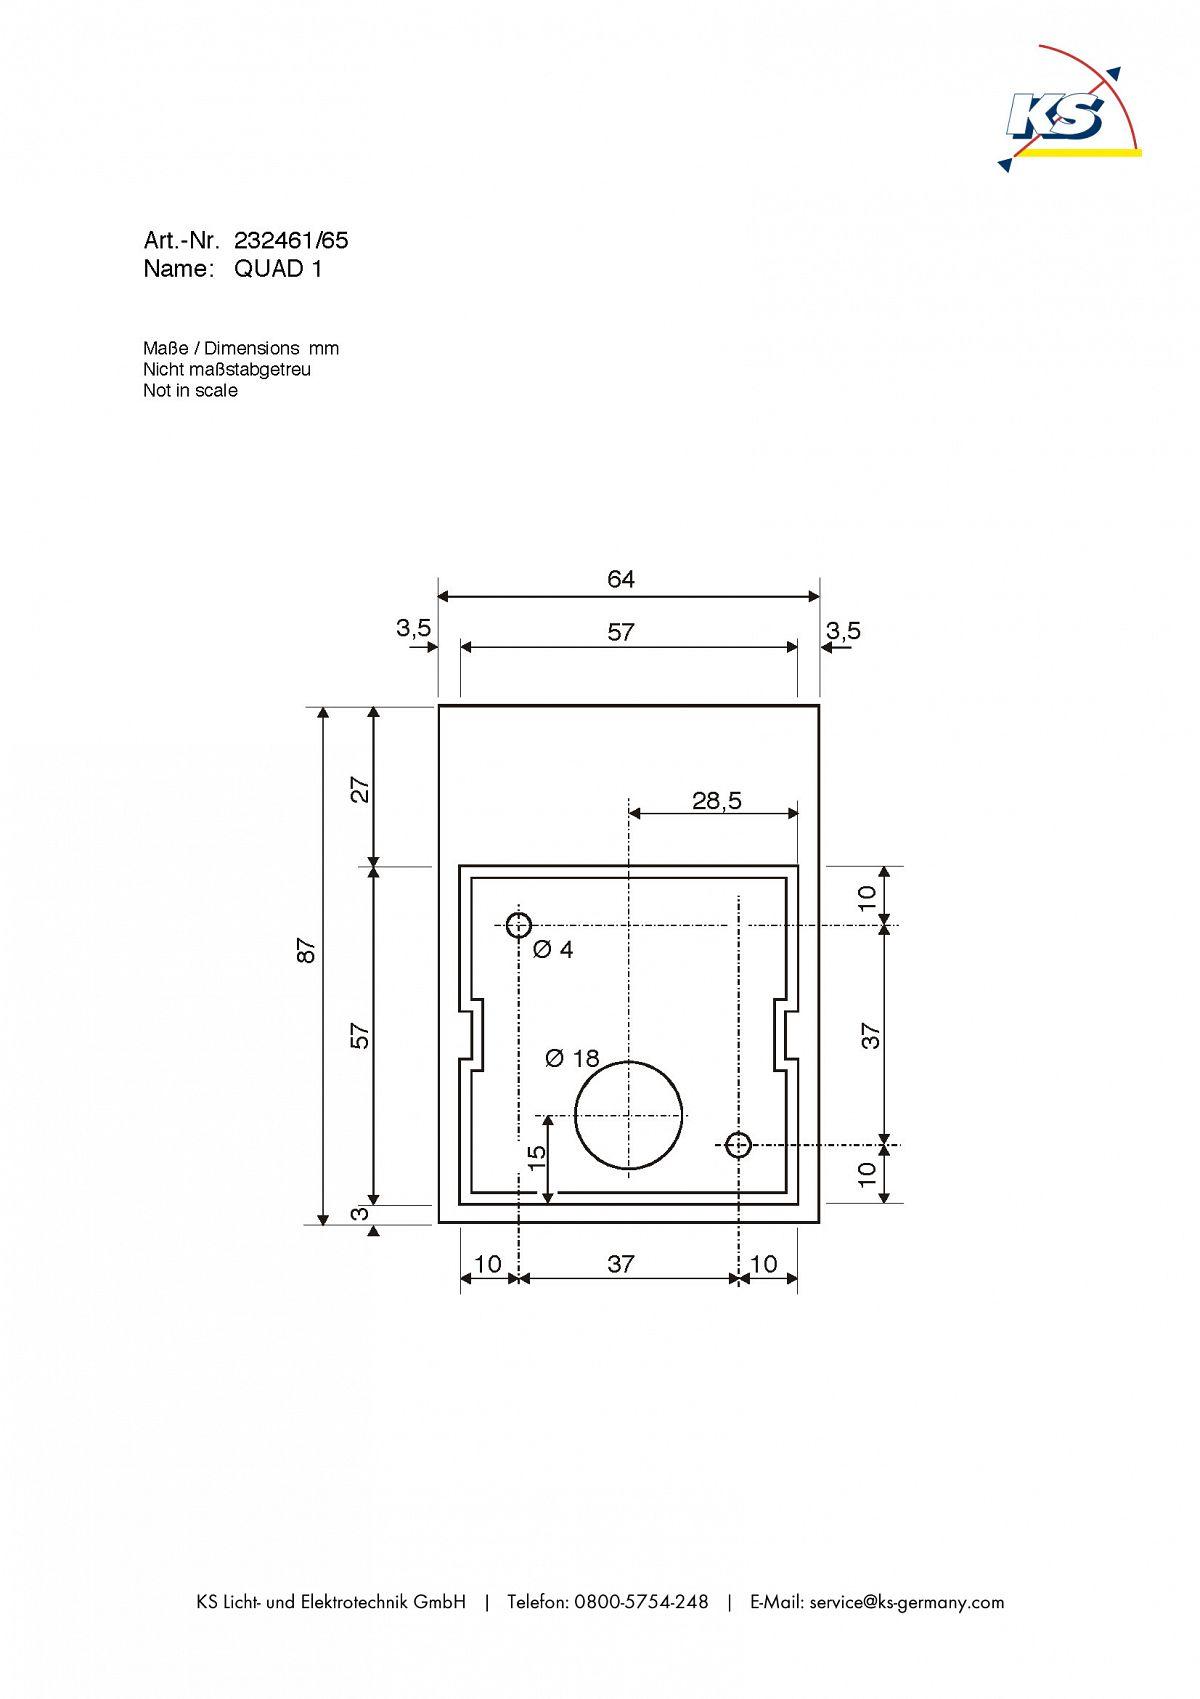 wandleuchte quad 1 eckig led warmwei 1x3w anthrazit slv ks licht onlineshop leuchten. Black Bedroom Furniture Sets. Home Design Ideas